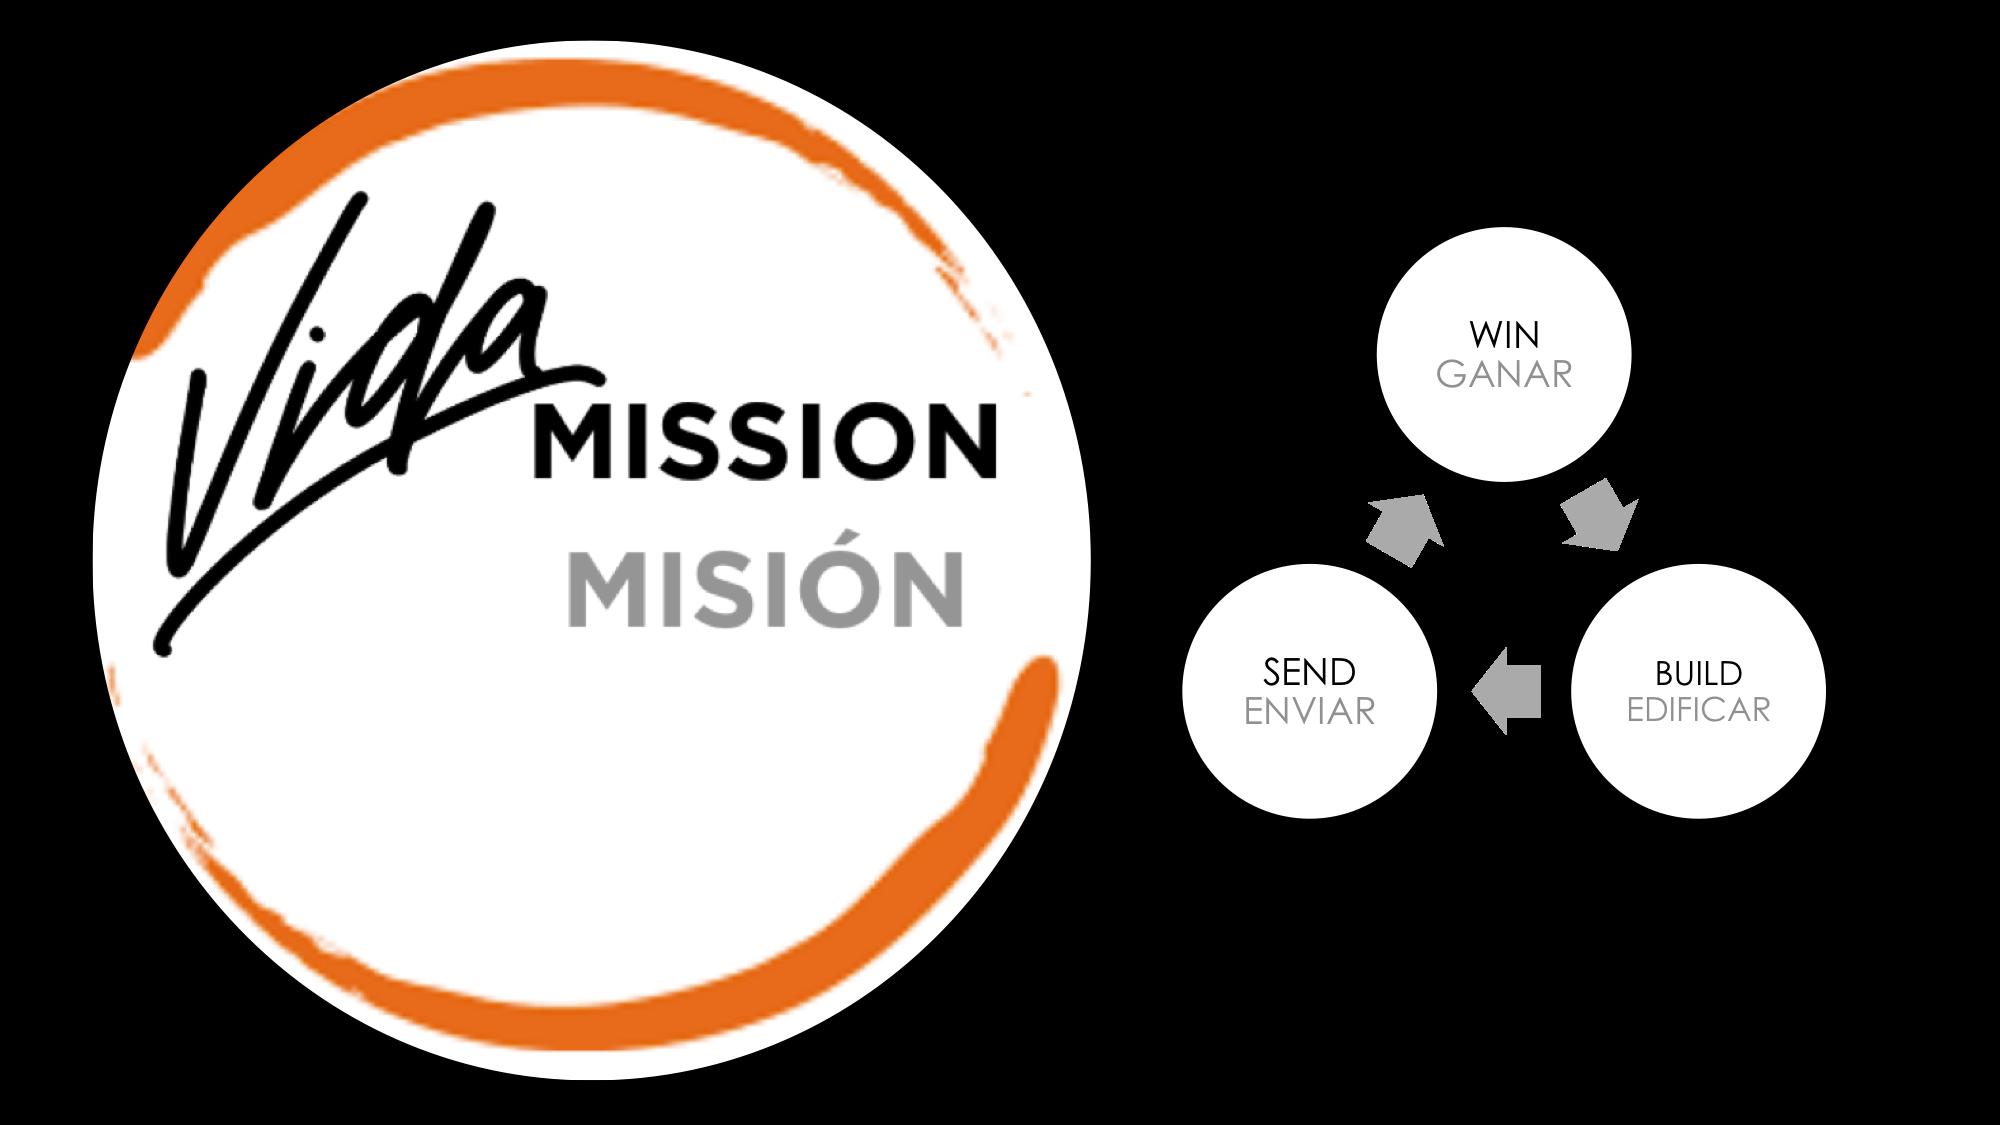 VIDA Mission Graphics